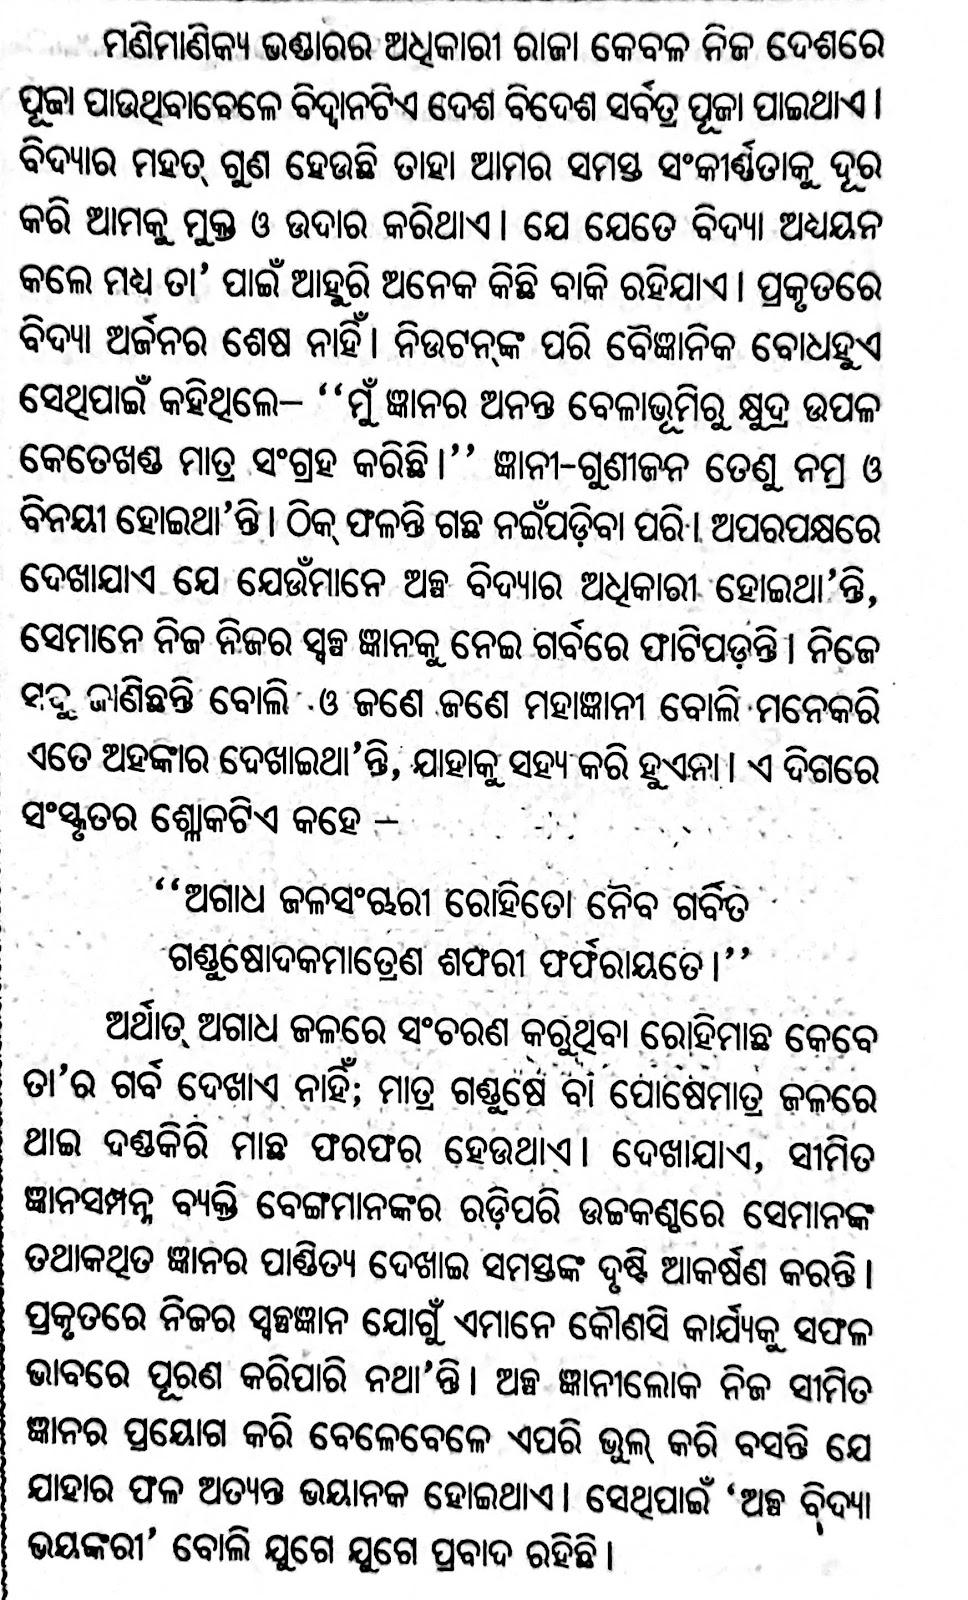 alpa vidya bhayankari essay in odia